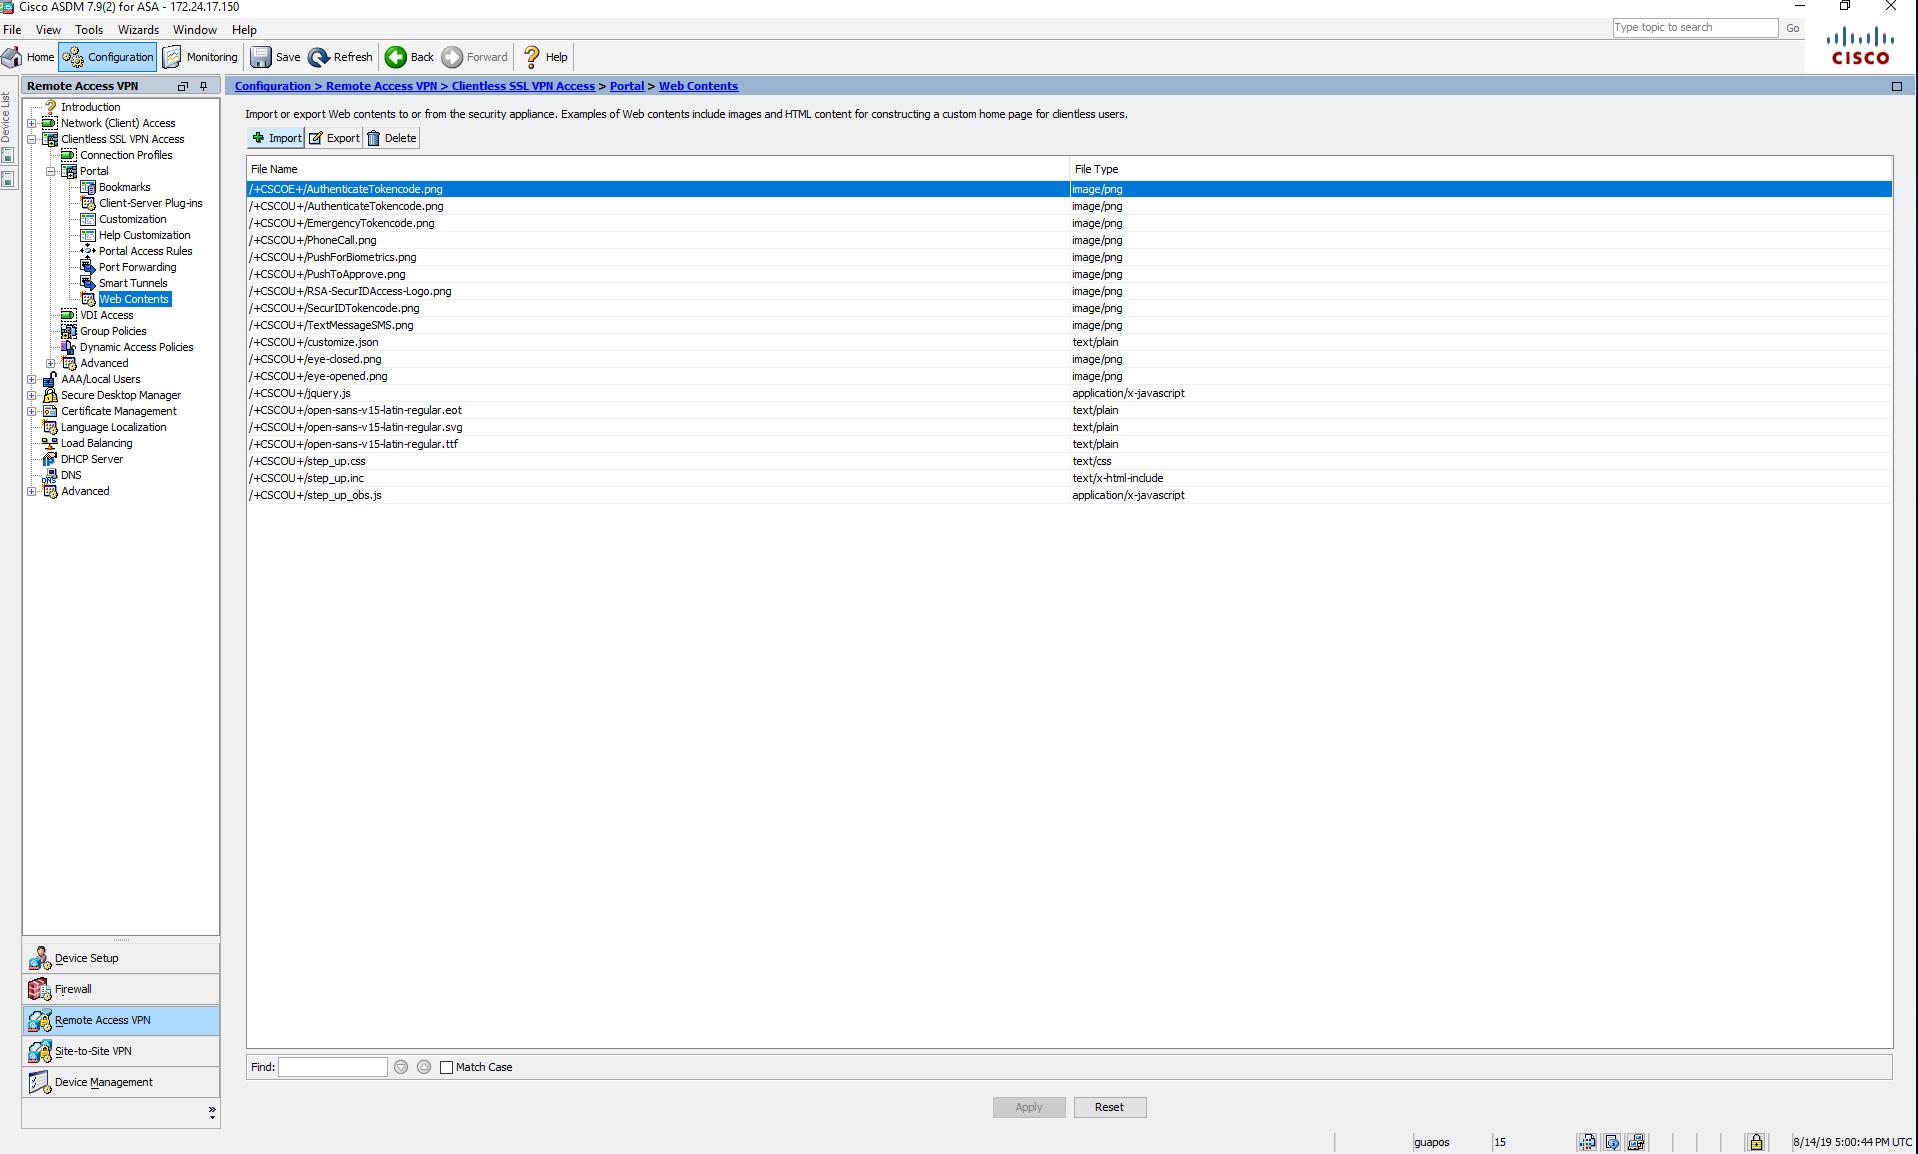 securid_ngx_g_cisco_import_file.png